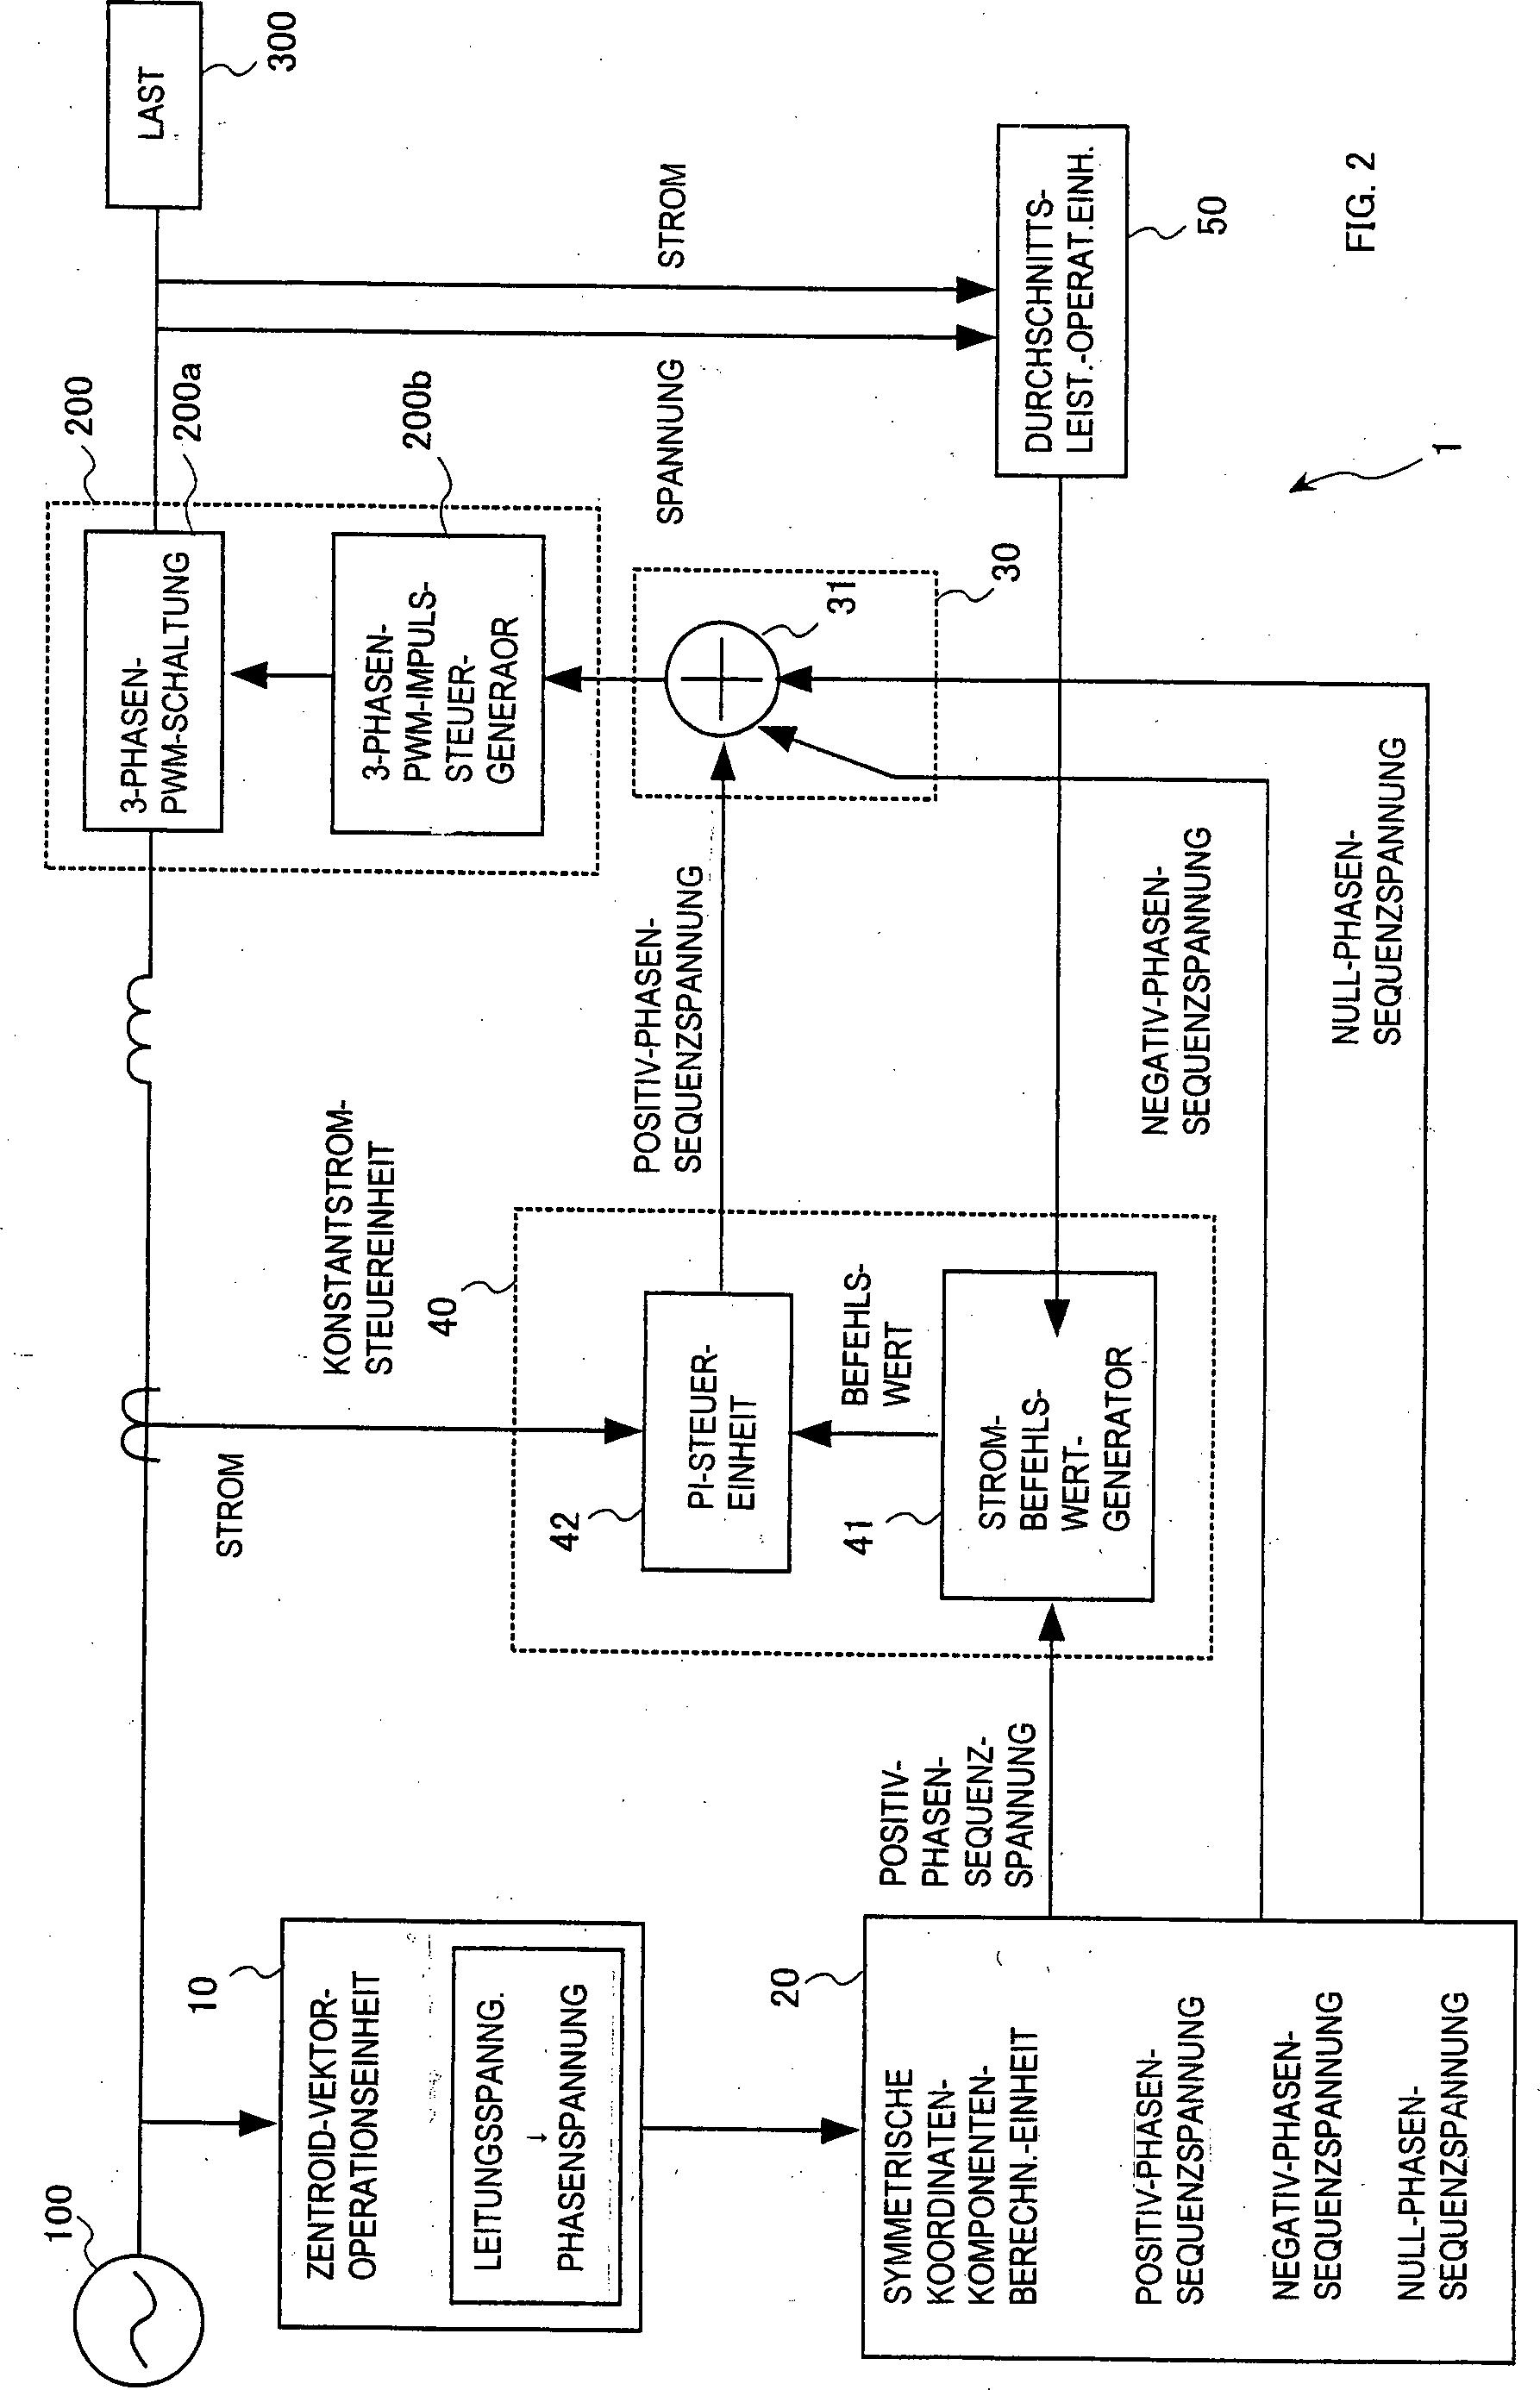 patent de102010053638a1 kompensationsverfahren f r. Black Bedroom Furniture Sets. Home Design Ideas